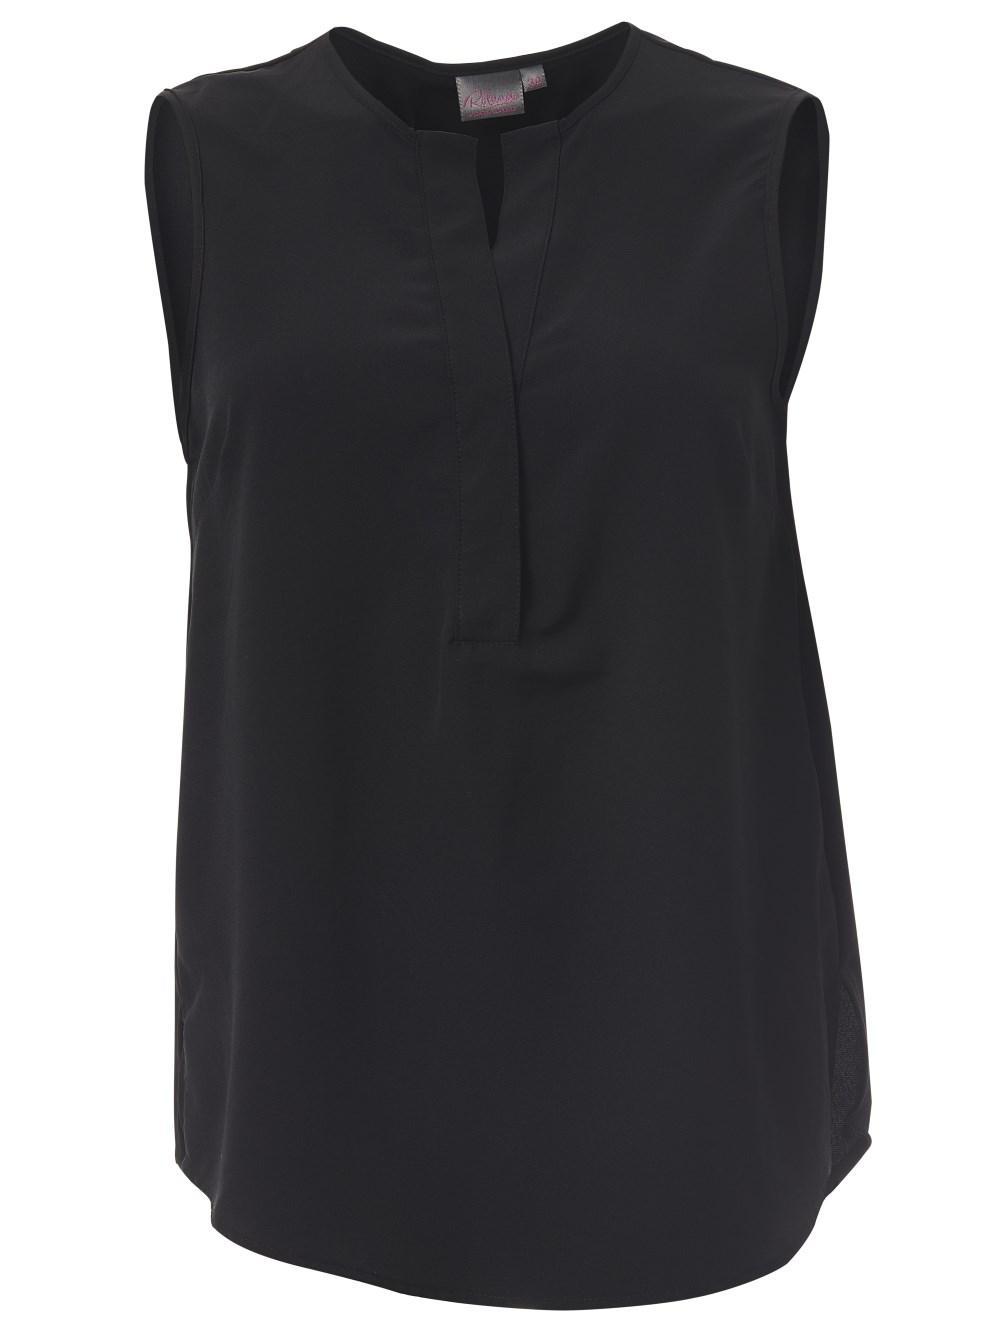 Kaylee K225 S/less Blouse - Black